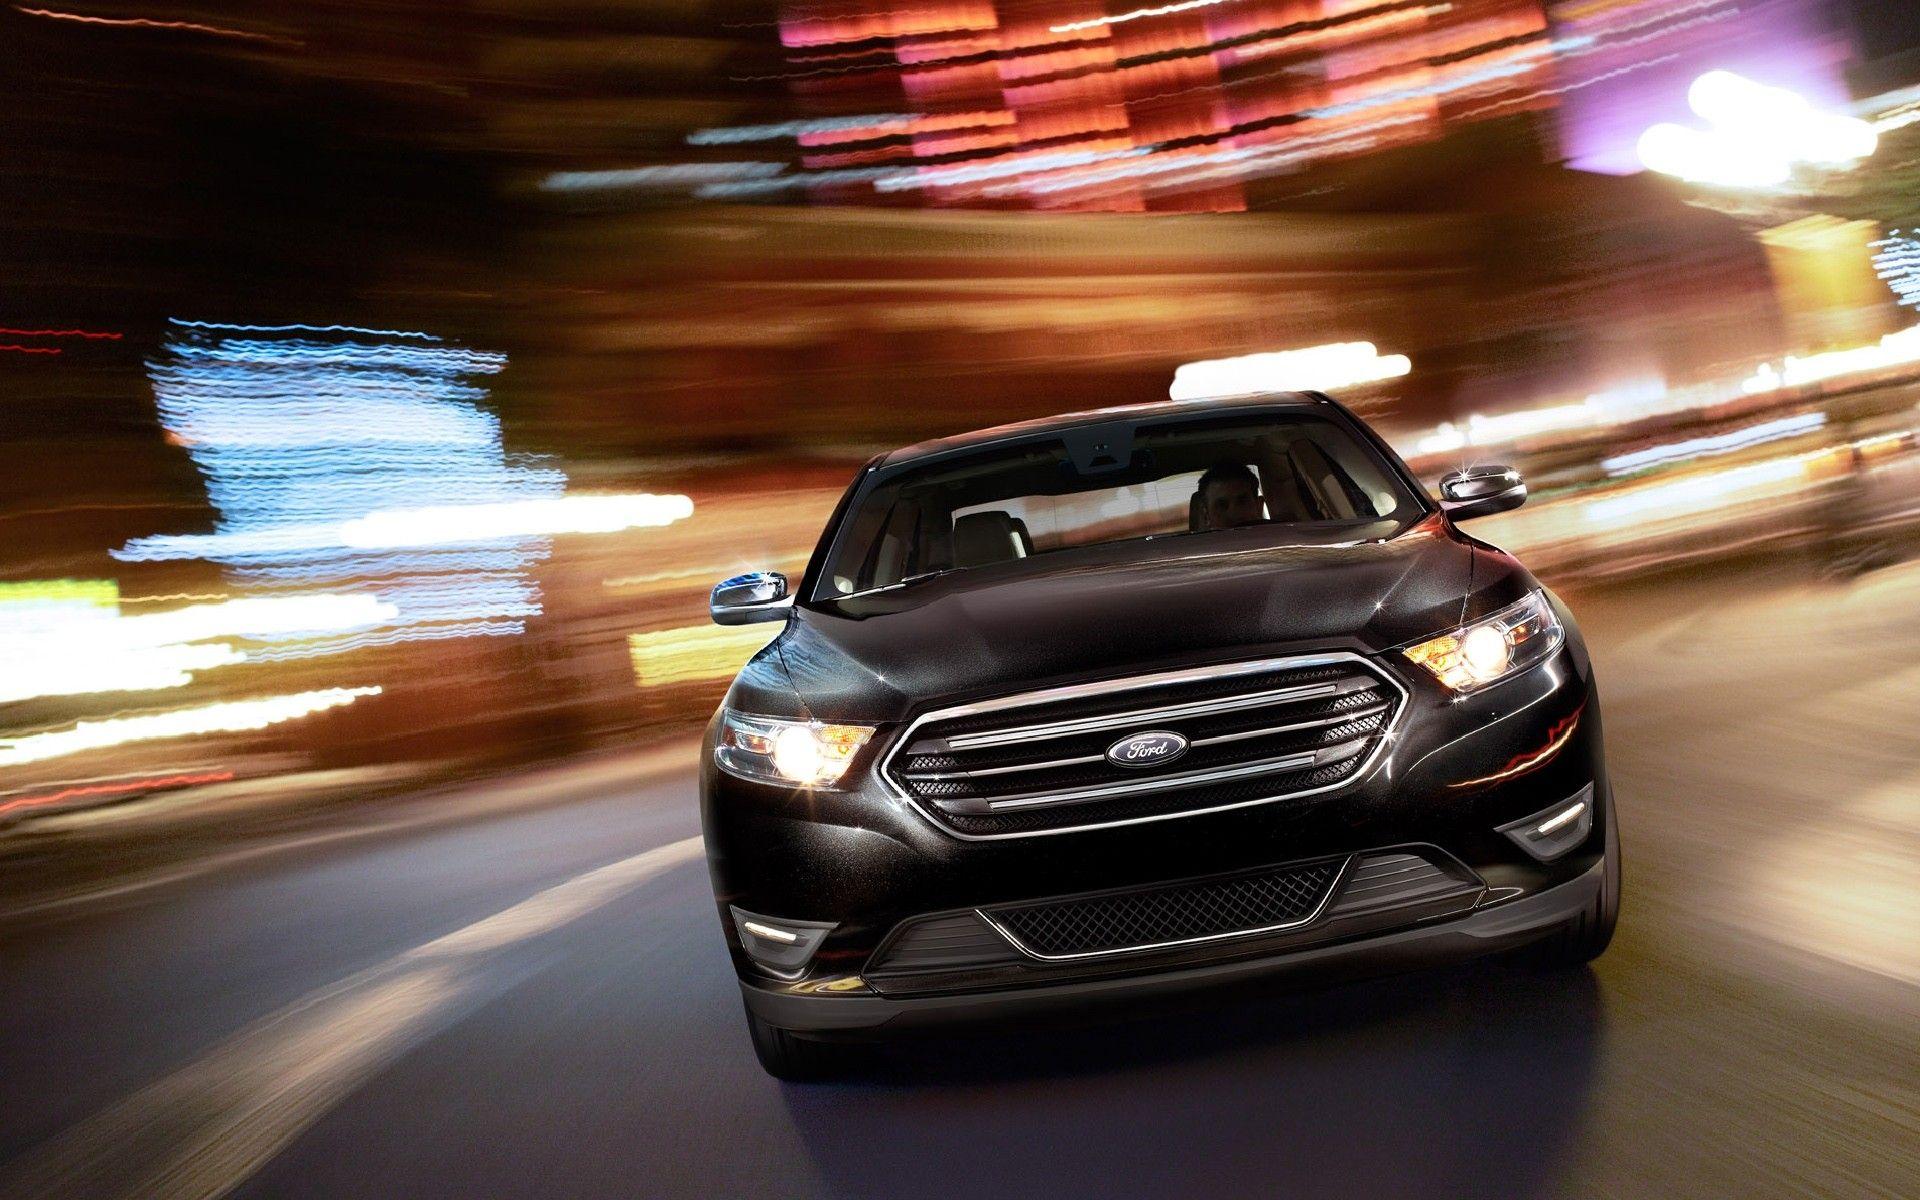 Ford Taurus Sedan New Model Images For Desktop And Wallpaper